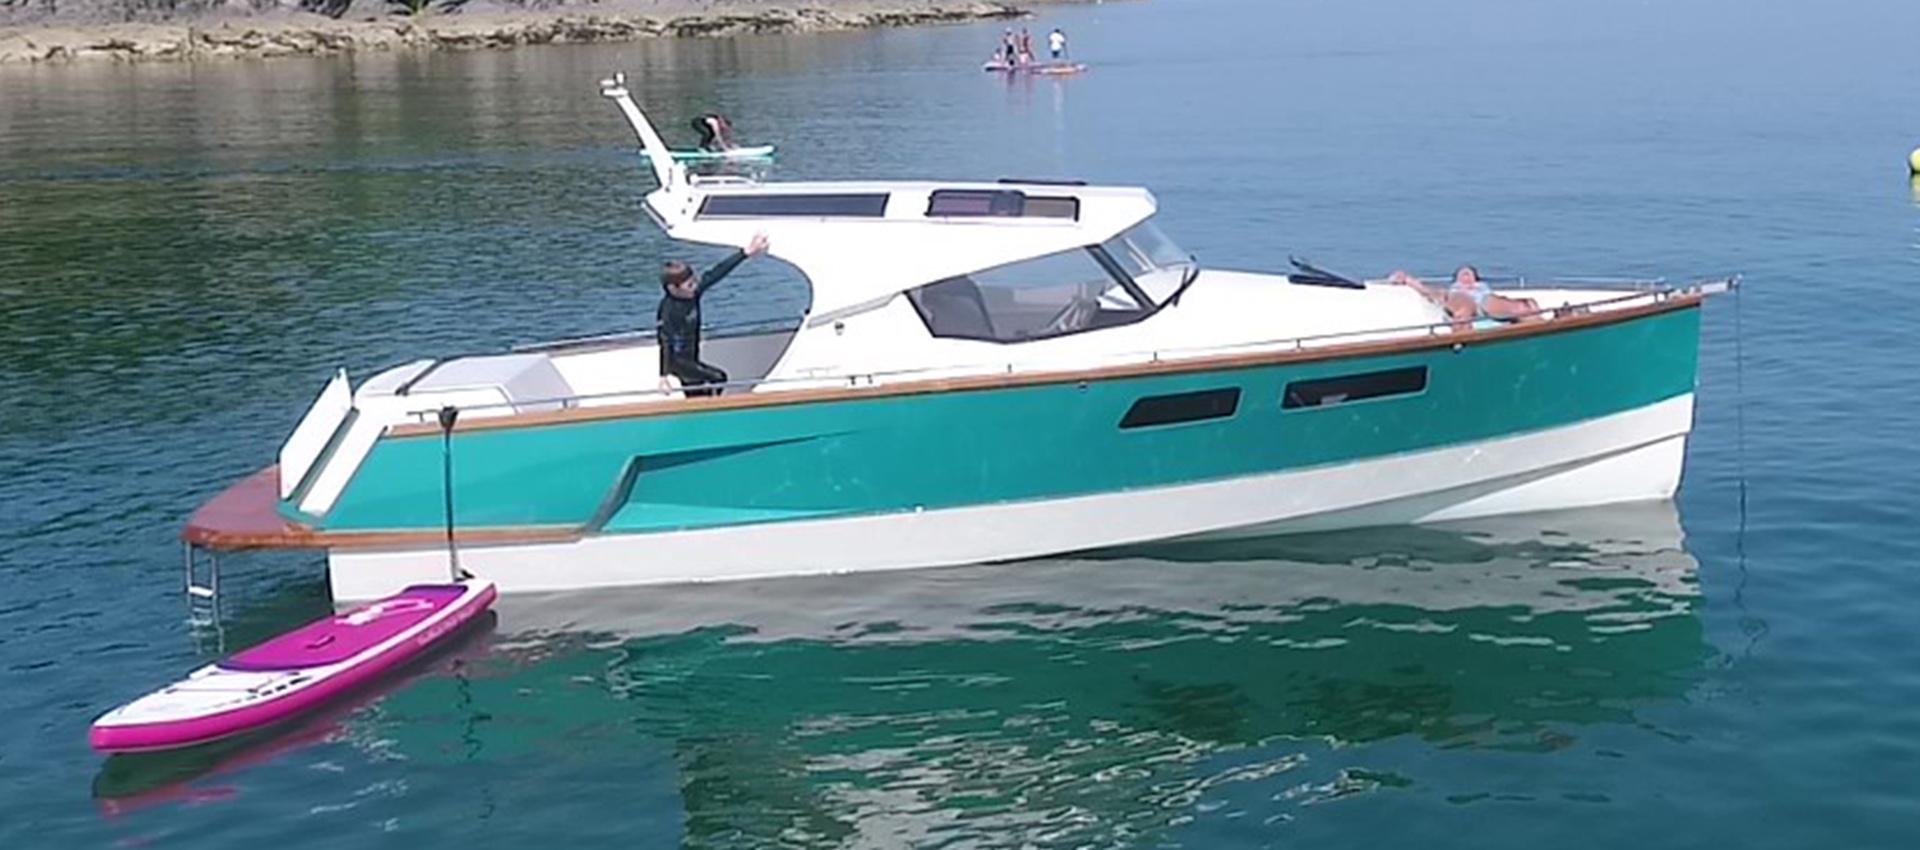 Swallow Yachts Whisper 300